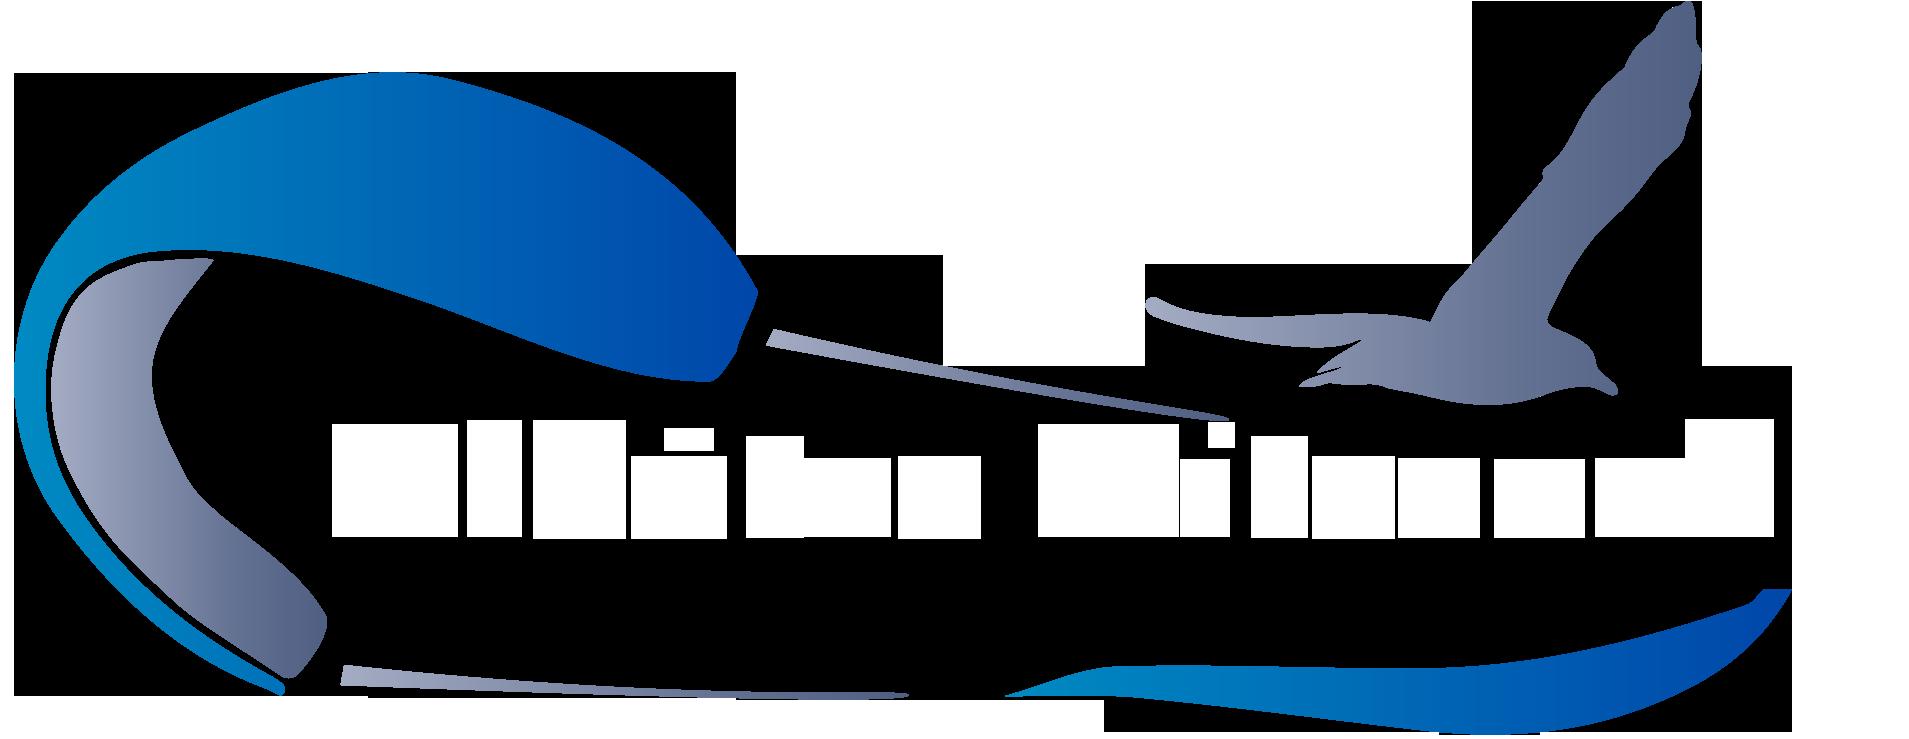 Albatre Kitesurf